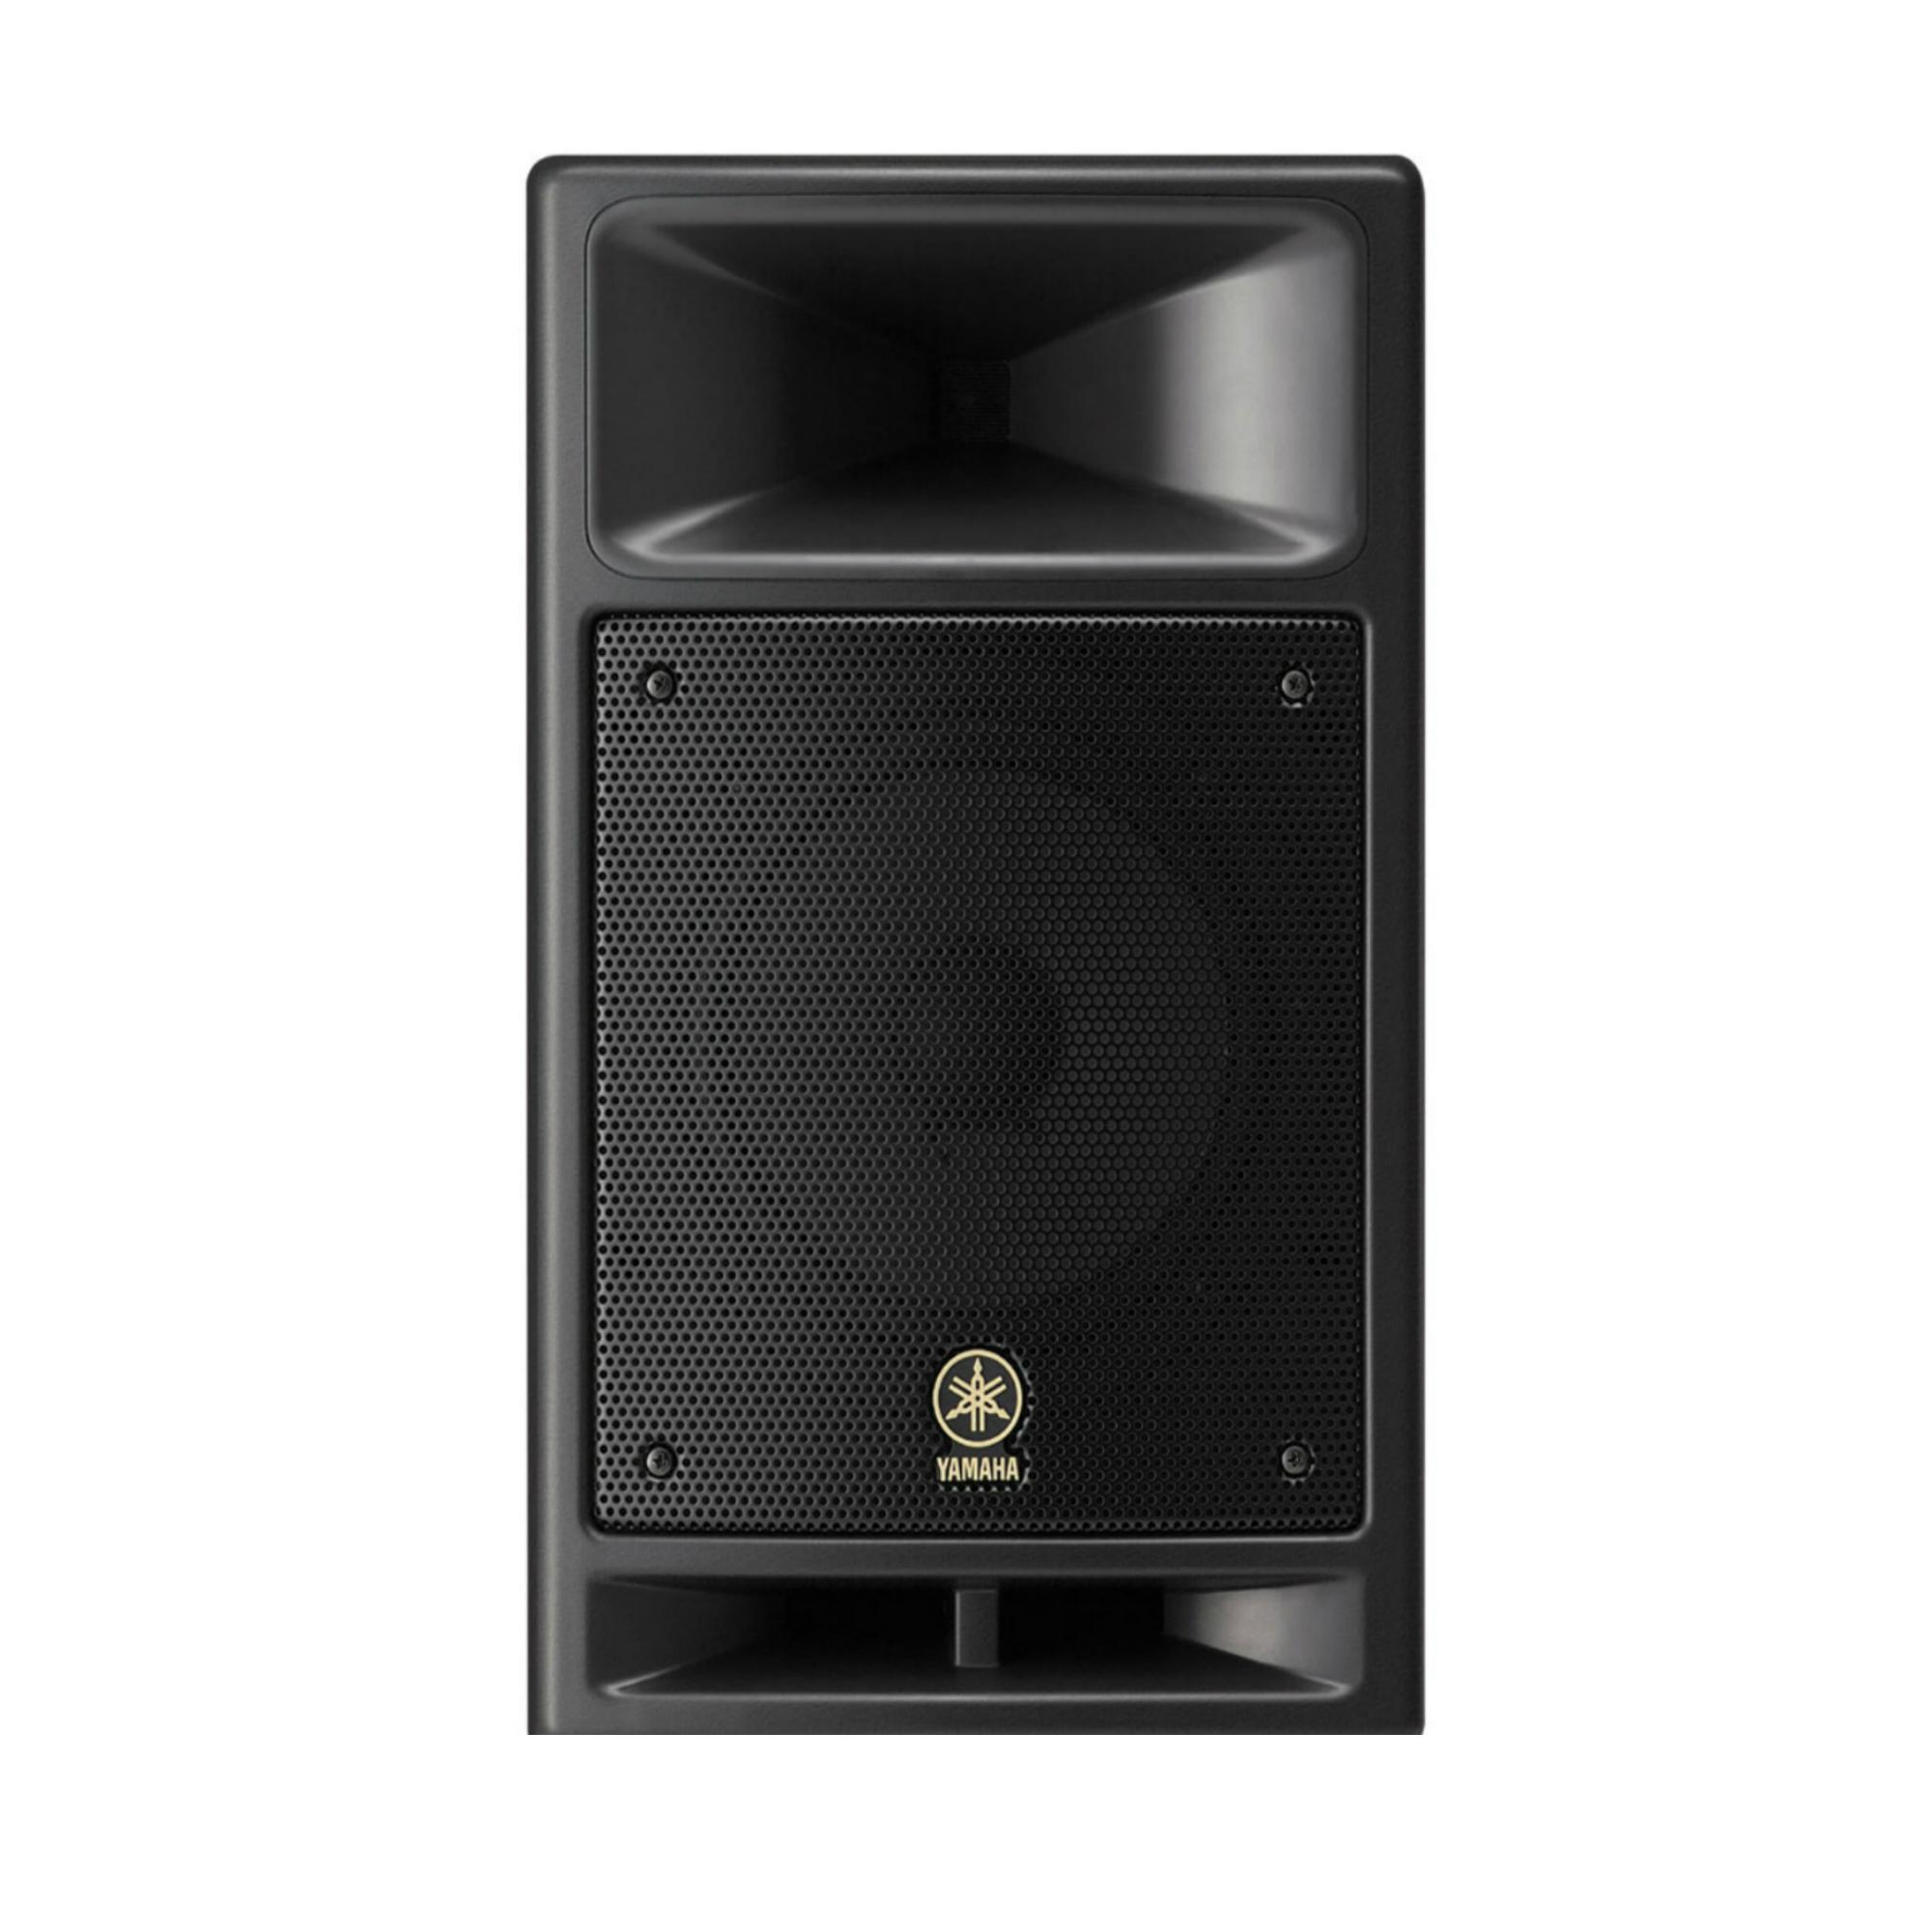 Yamaha msr100 8 inch powered speaker rental dj peoples for Yamaha dj speaker